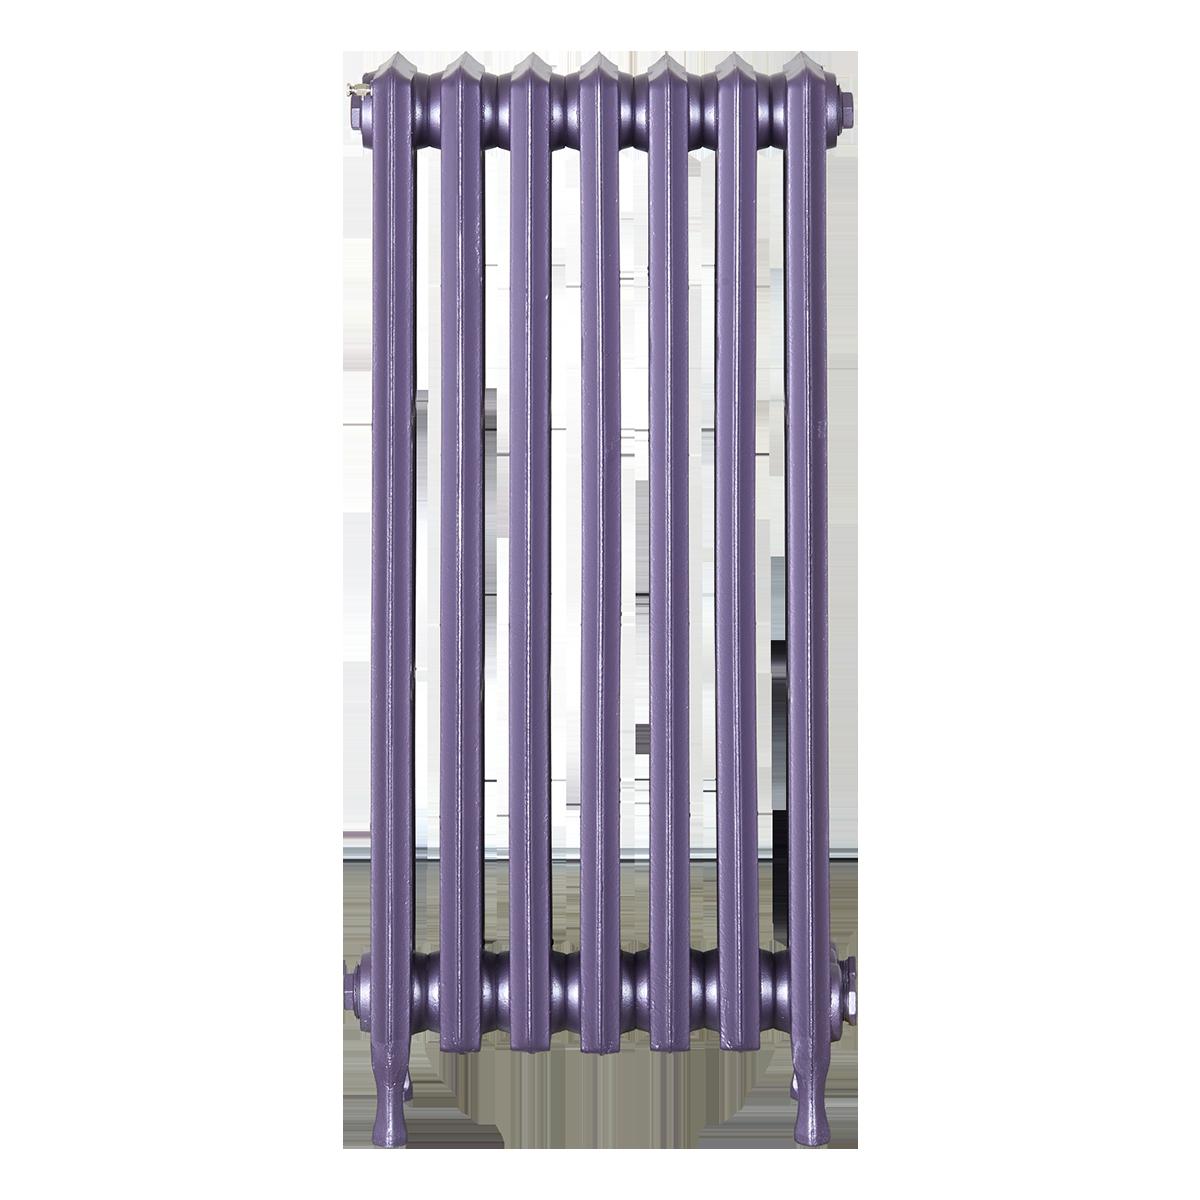 Ironworks Radiators Inc. refurbished cast iron radiator Alhart in Lilac metallic